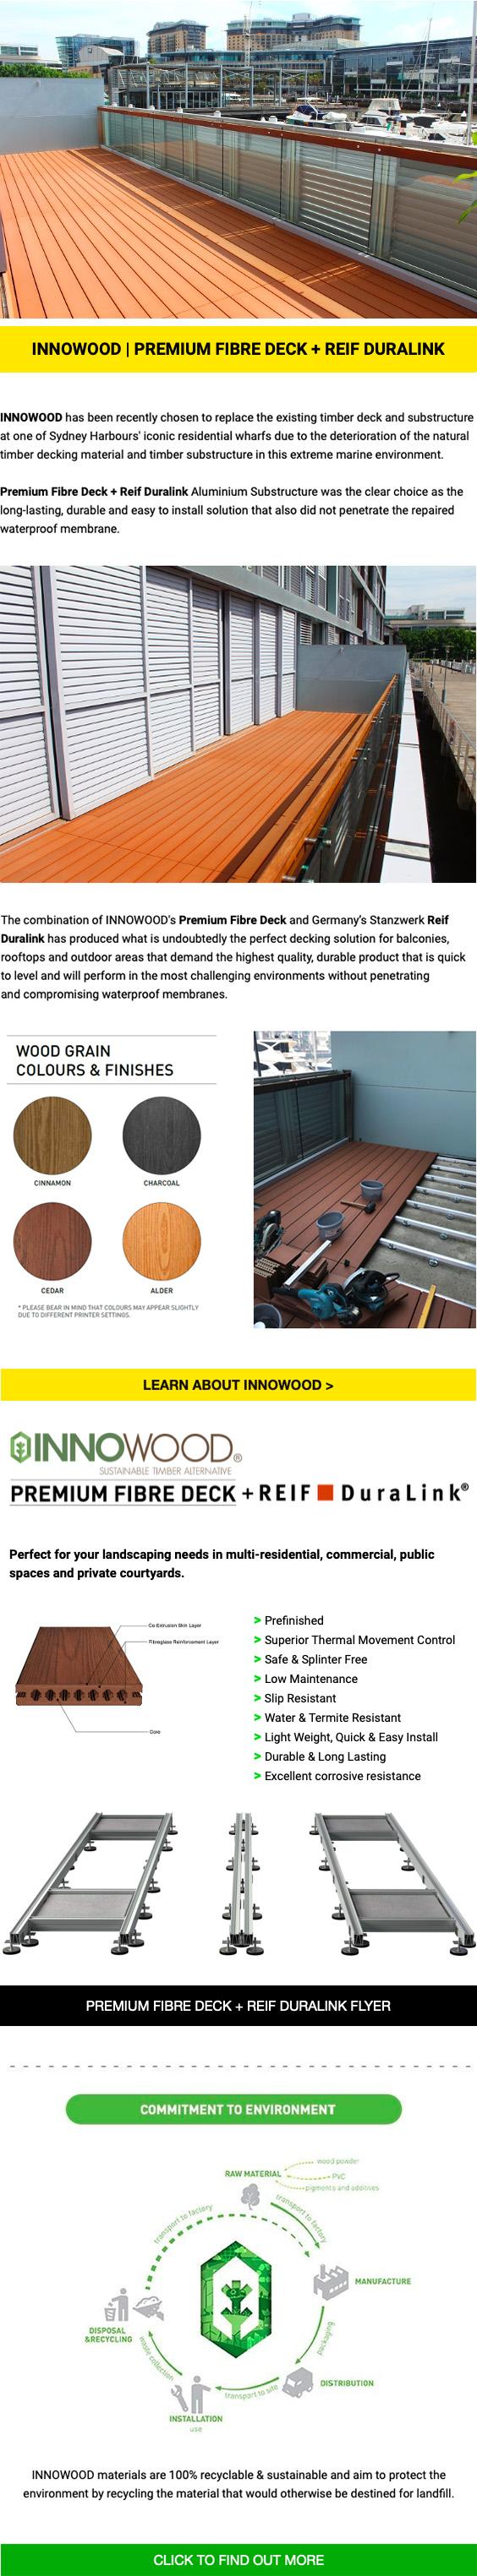 March 2020-INNOWOOD - Premium Fibre Deck + Reif Duralink Substructure